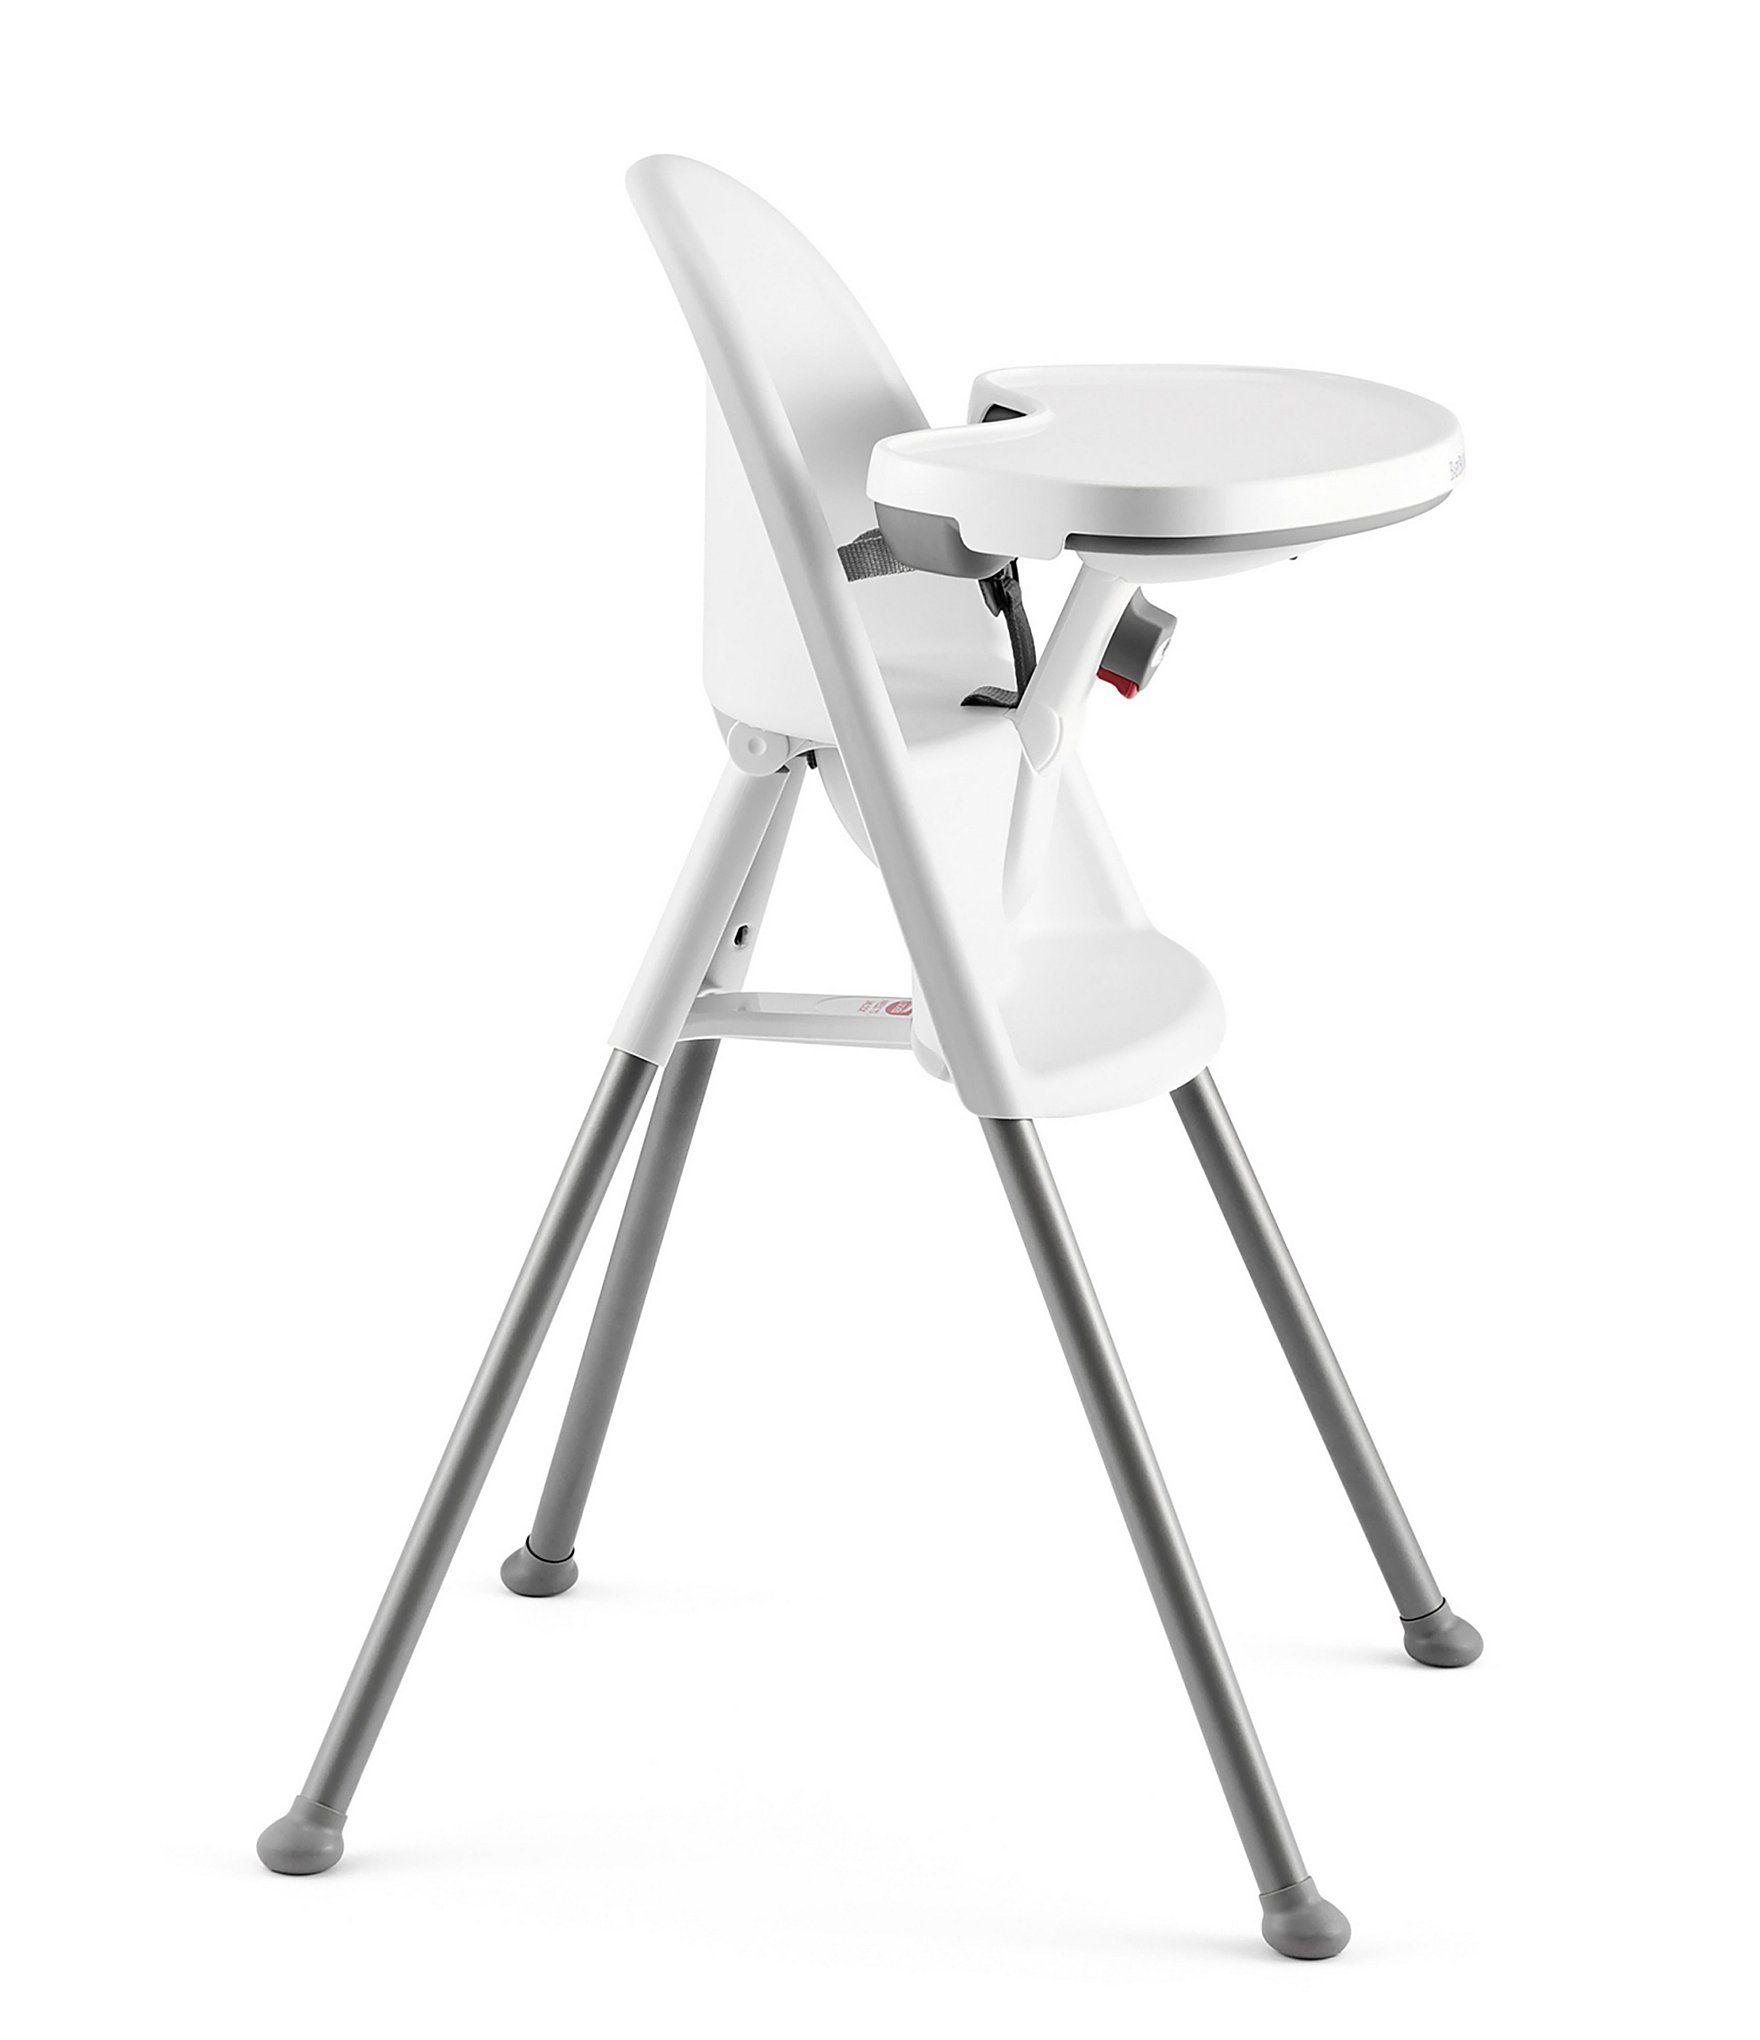 Babybjorn High Chair White Grey N A In 2020 Baby Bjorn Chair